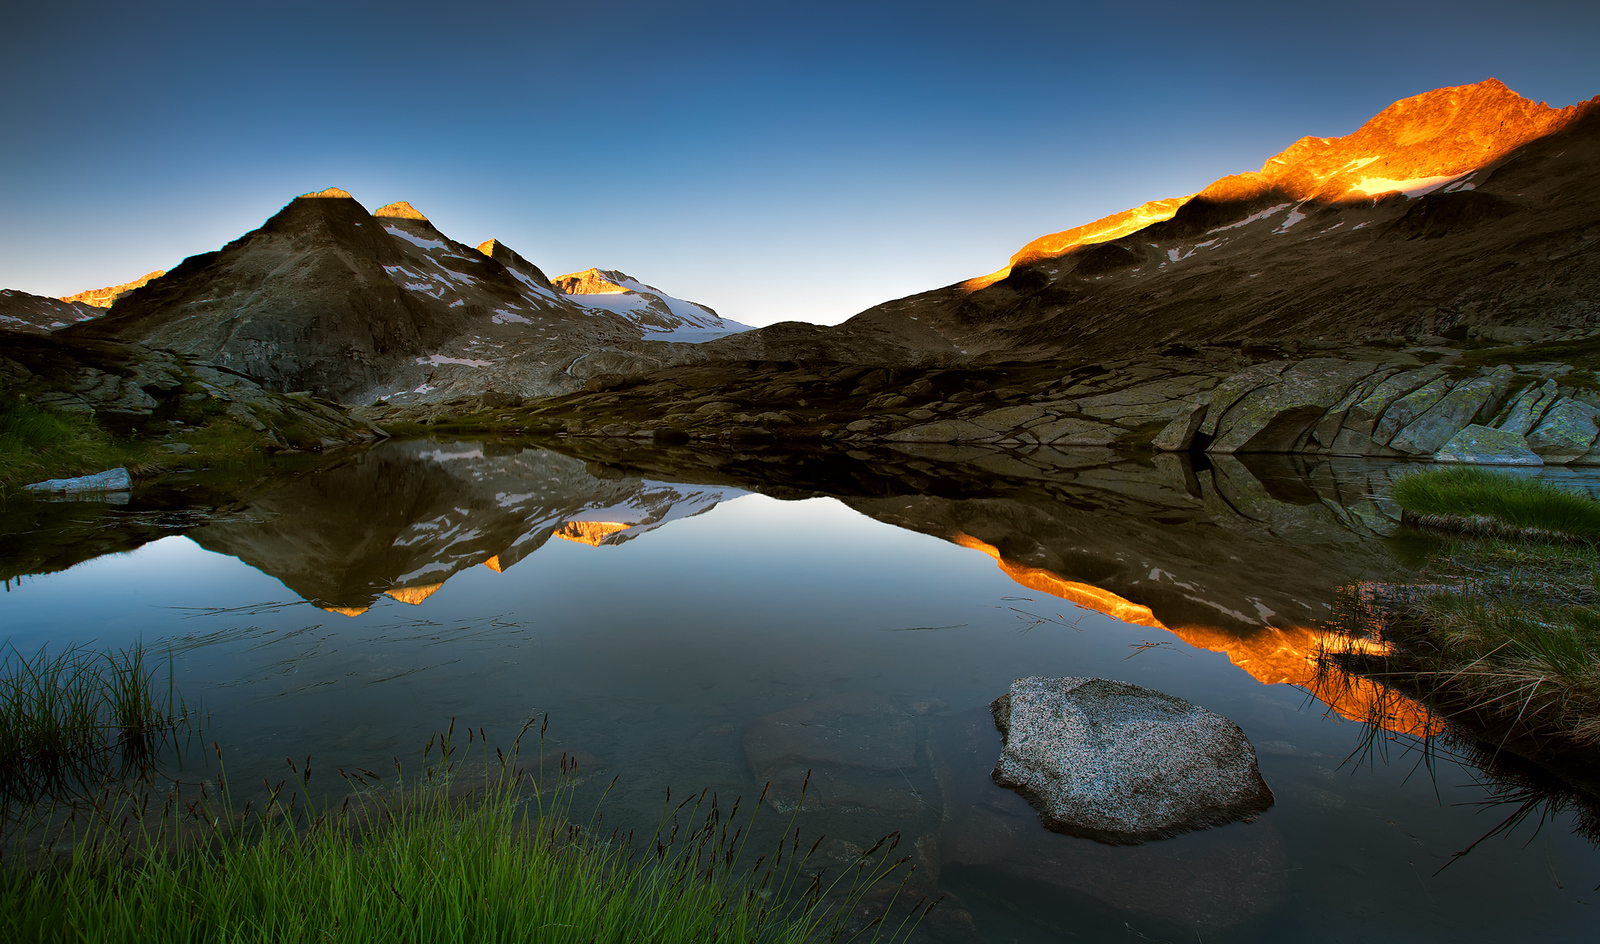 Laghi del Mandrone / Dolomiti di Brenta